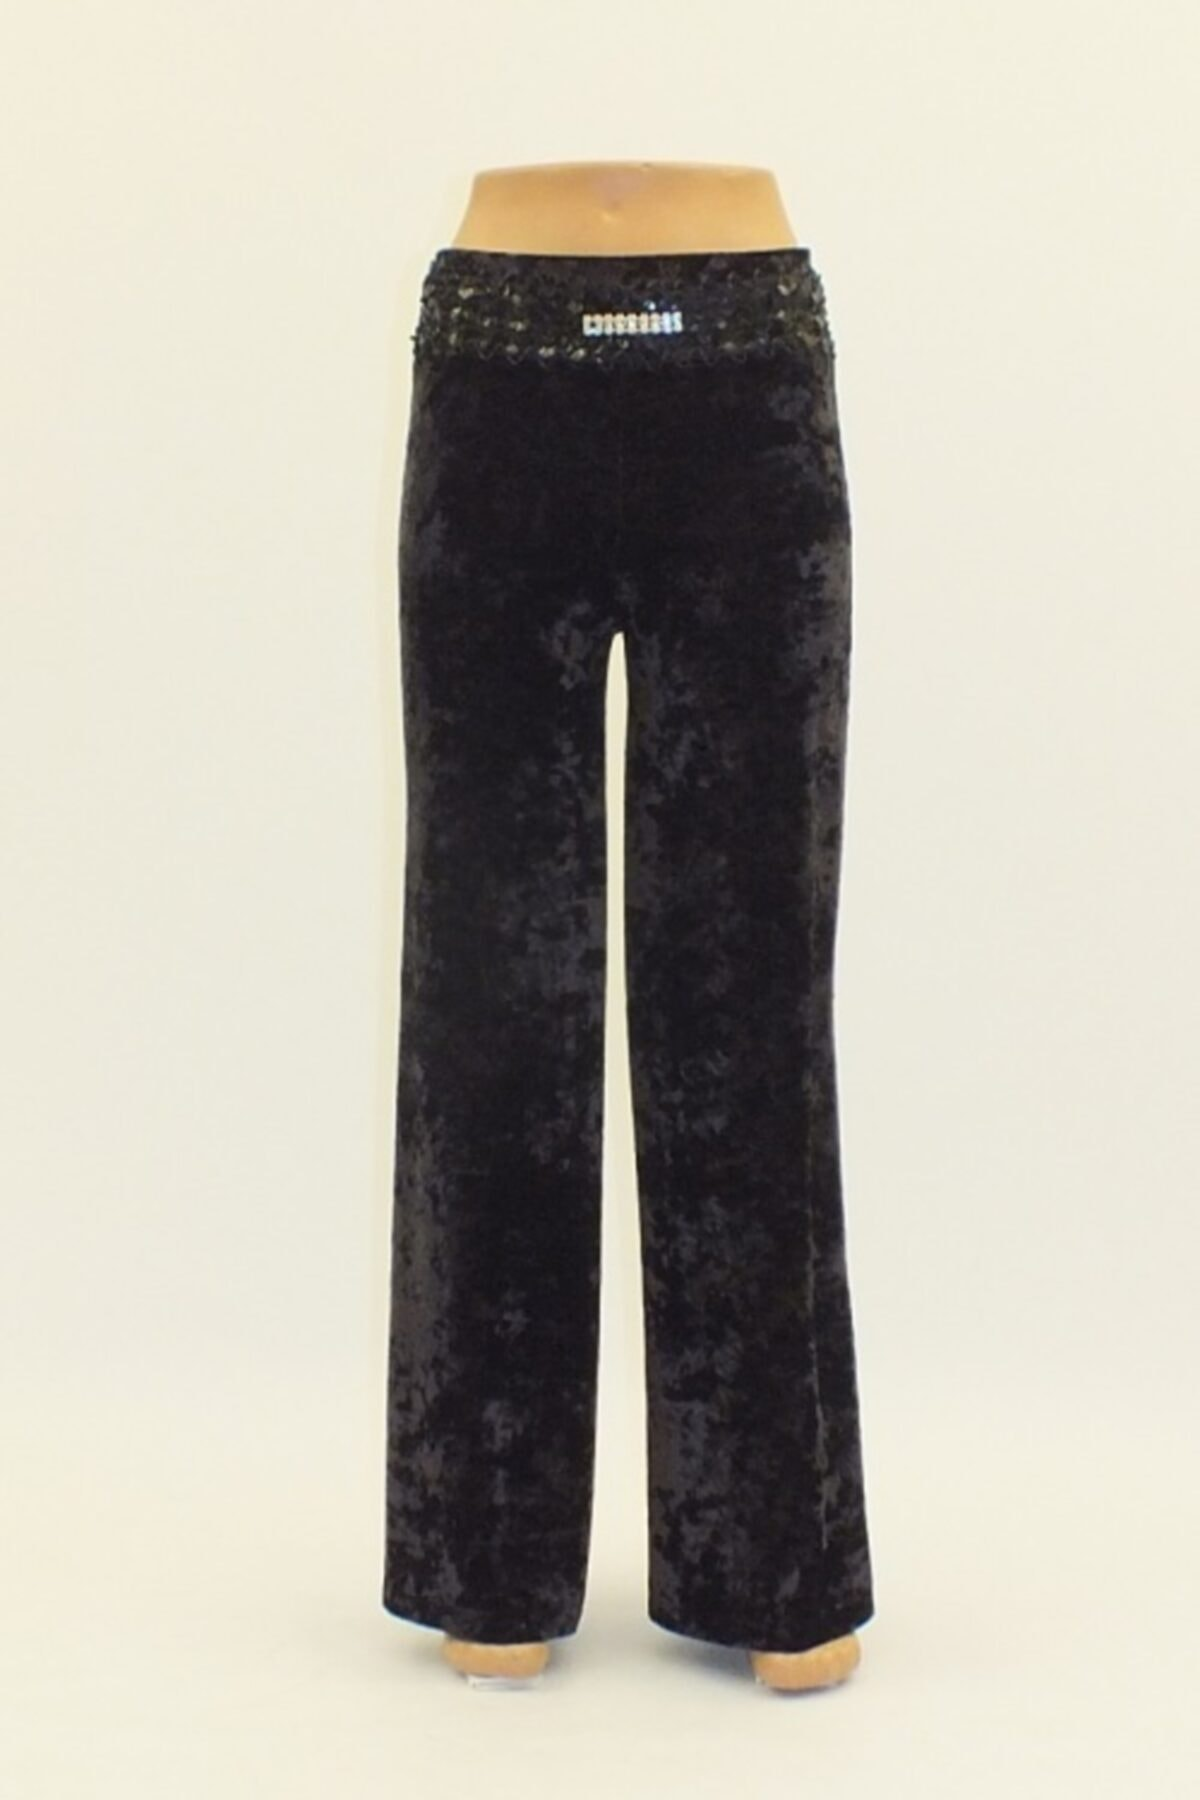 Otto Kadın Siyah Kadife Geniş Paça Yüksek Bel Pantolon 1